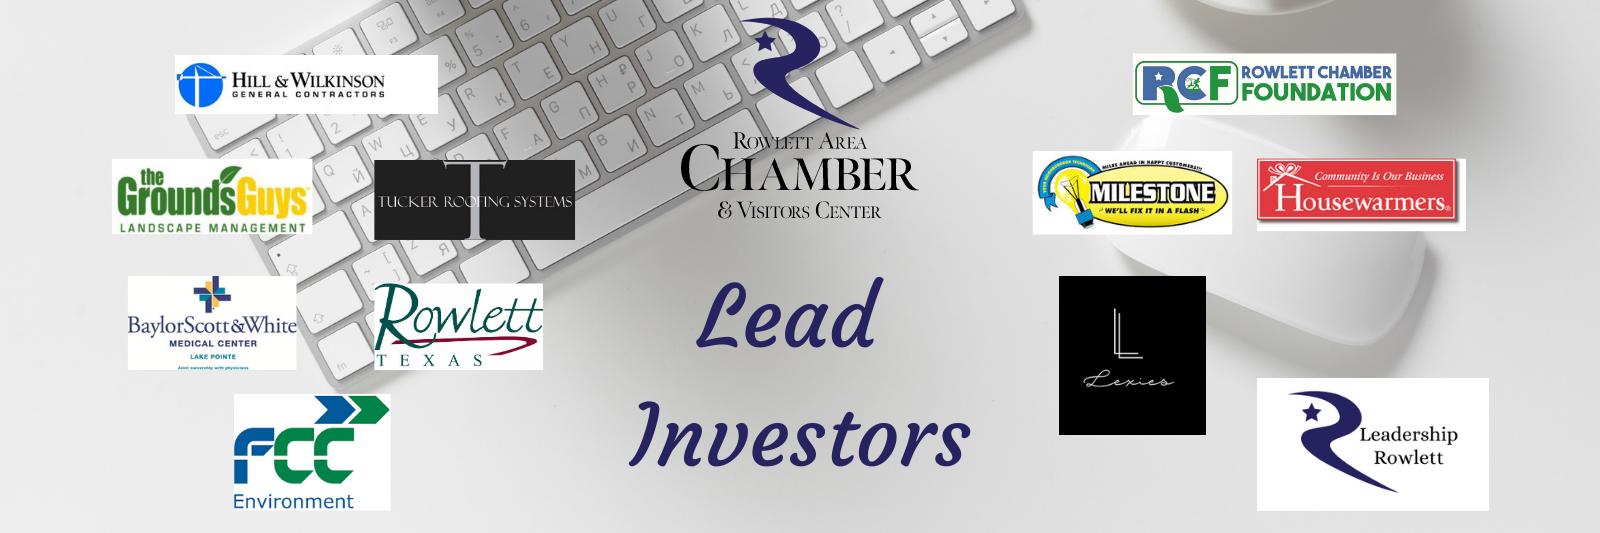 Lead-Investors-3.29.2021.png